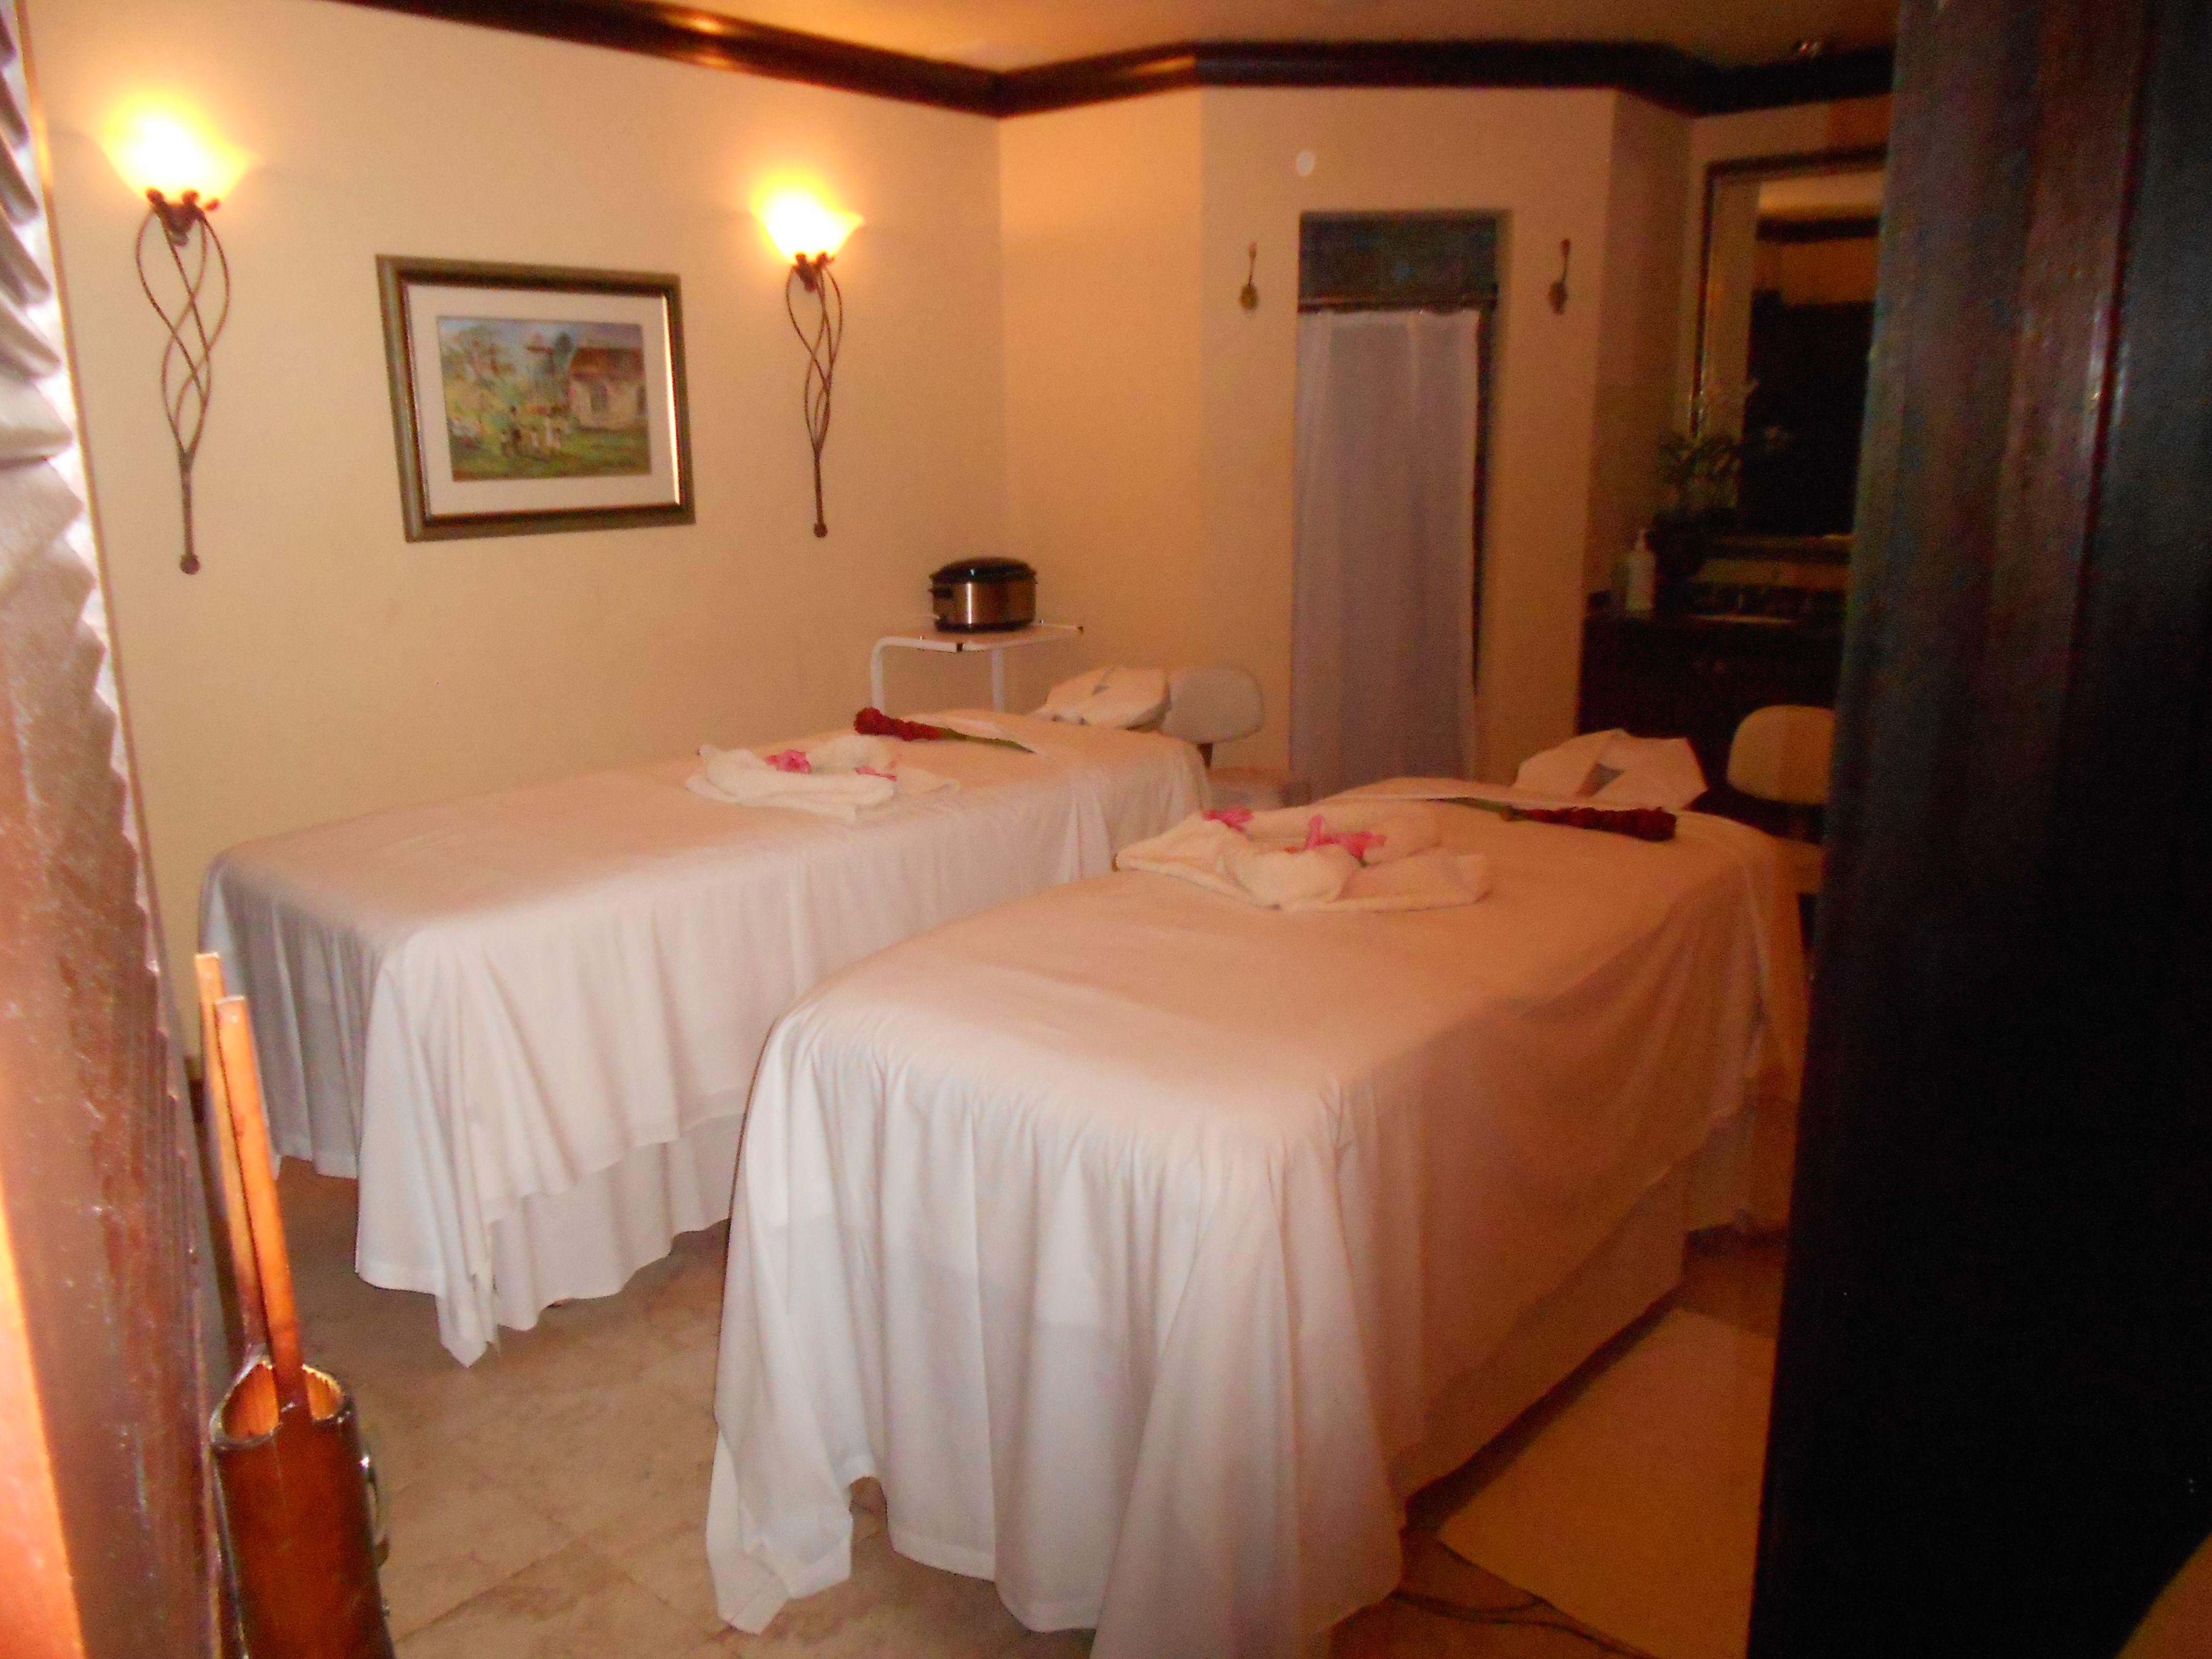 Couple 39 s massage room massage room ideas pinterest for Couples bedroom ideas pinterest